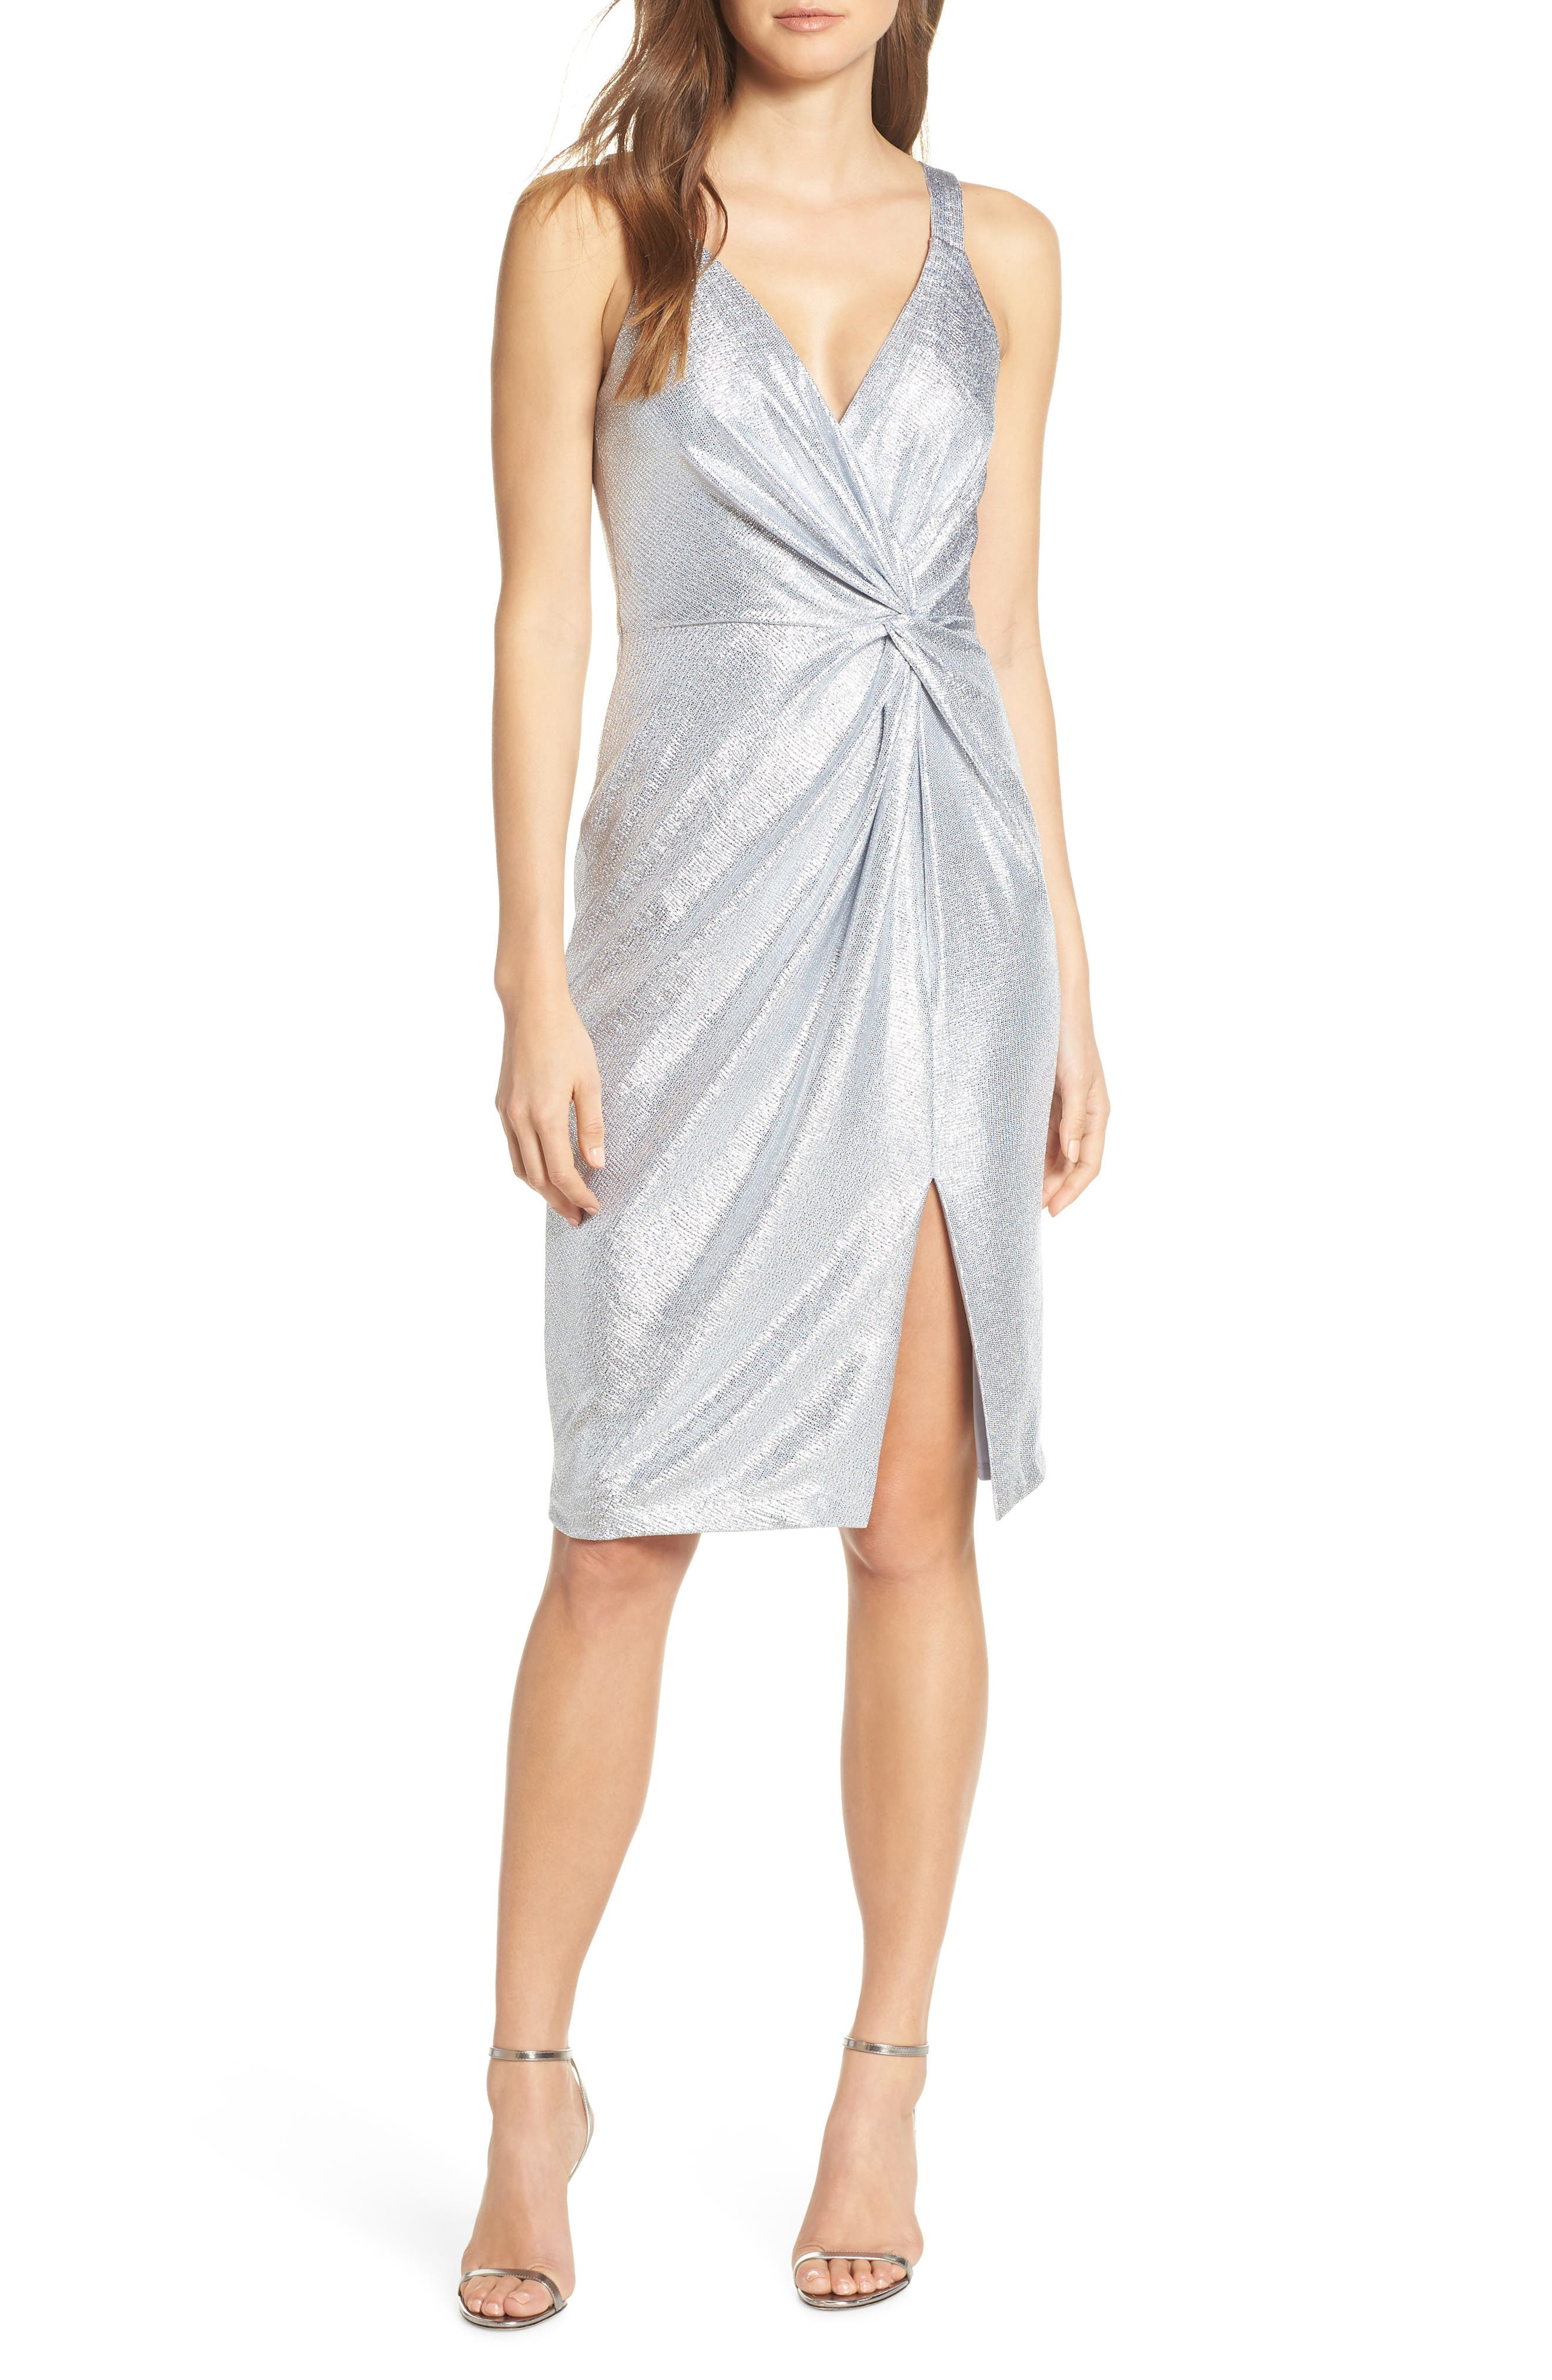 1960s – 70s Cocktail, Party, Prom, Evening Dresses Womens Eliza J Twisted Dress Size 2 - Blue $88.80 AT vintagedancer.com